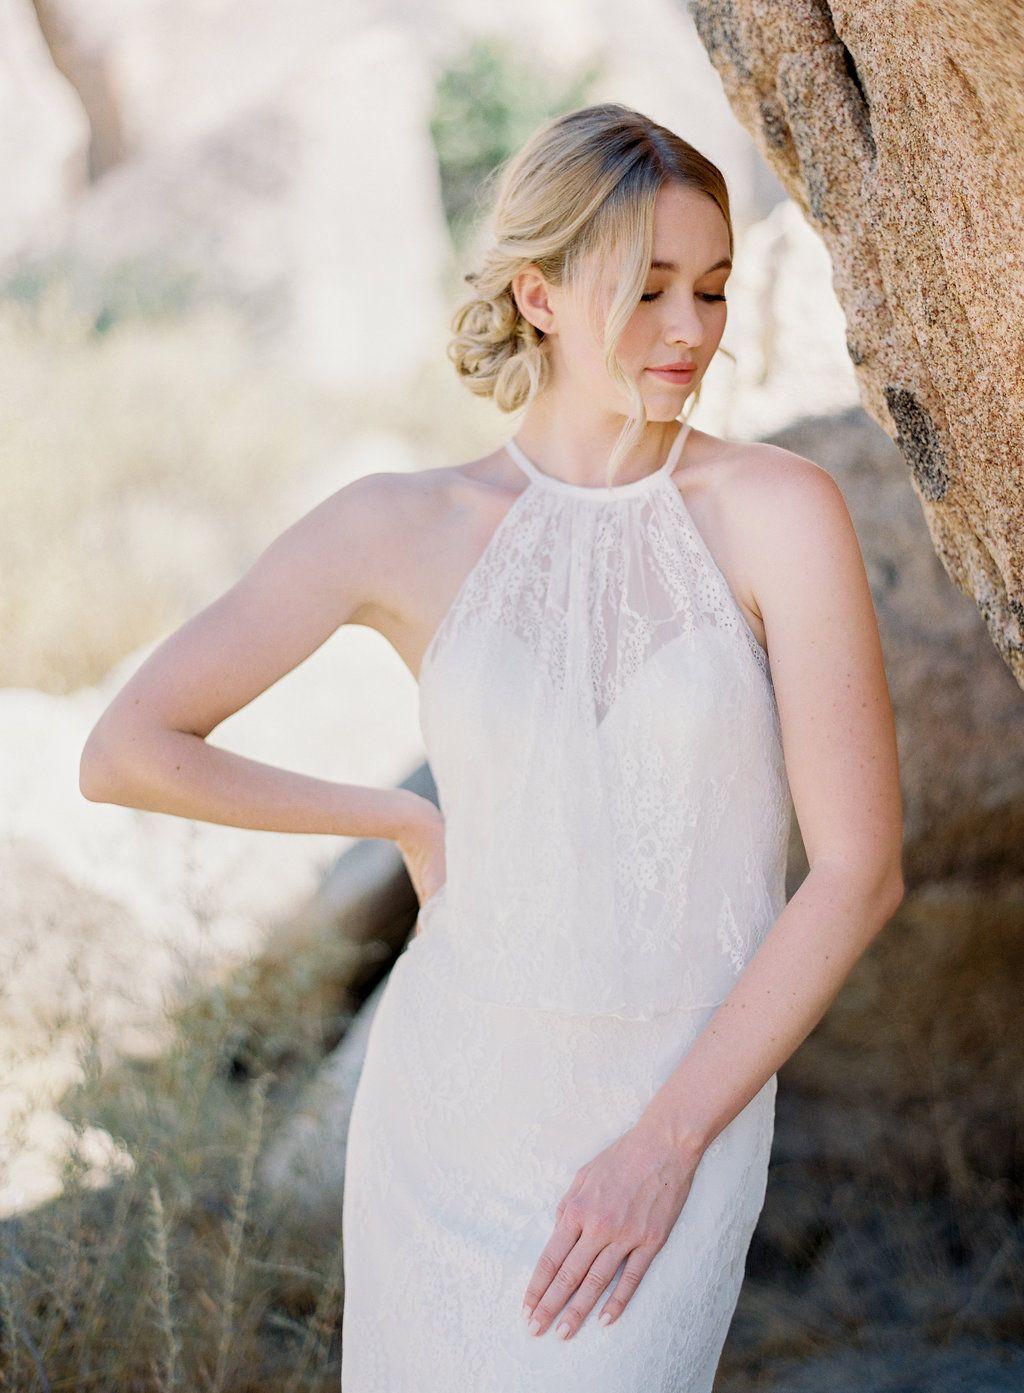 Pin By Studio I Do Bridals On Allure Wilderly Bridal Pinterest